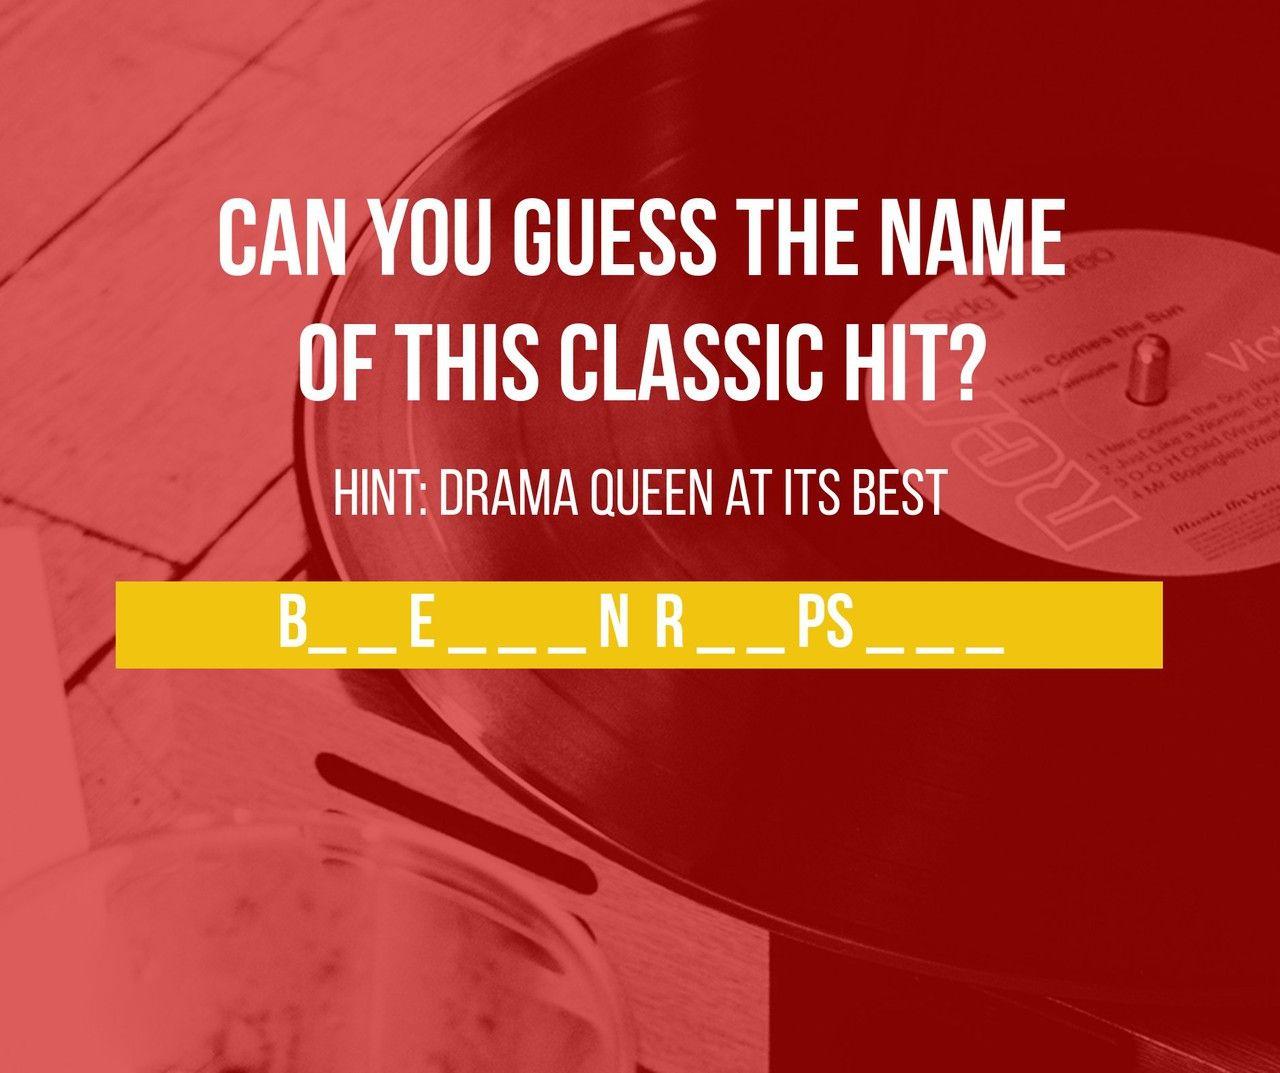 Answer bohemian rhapsody queen term life best